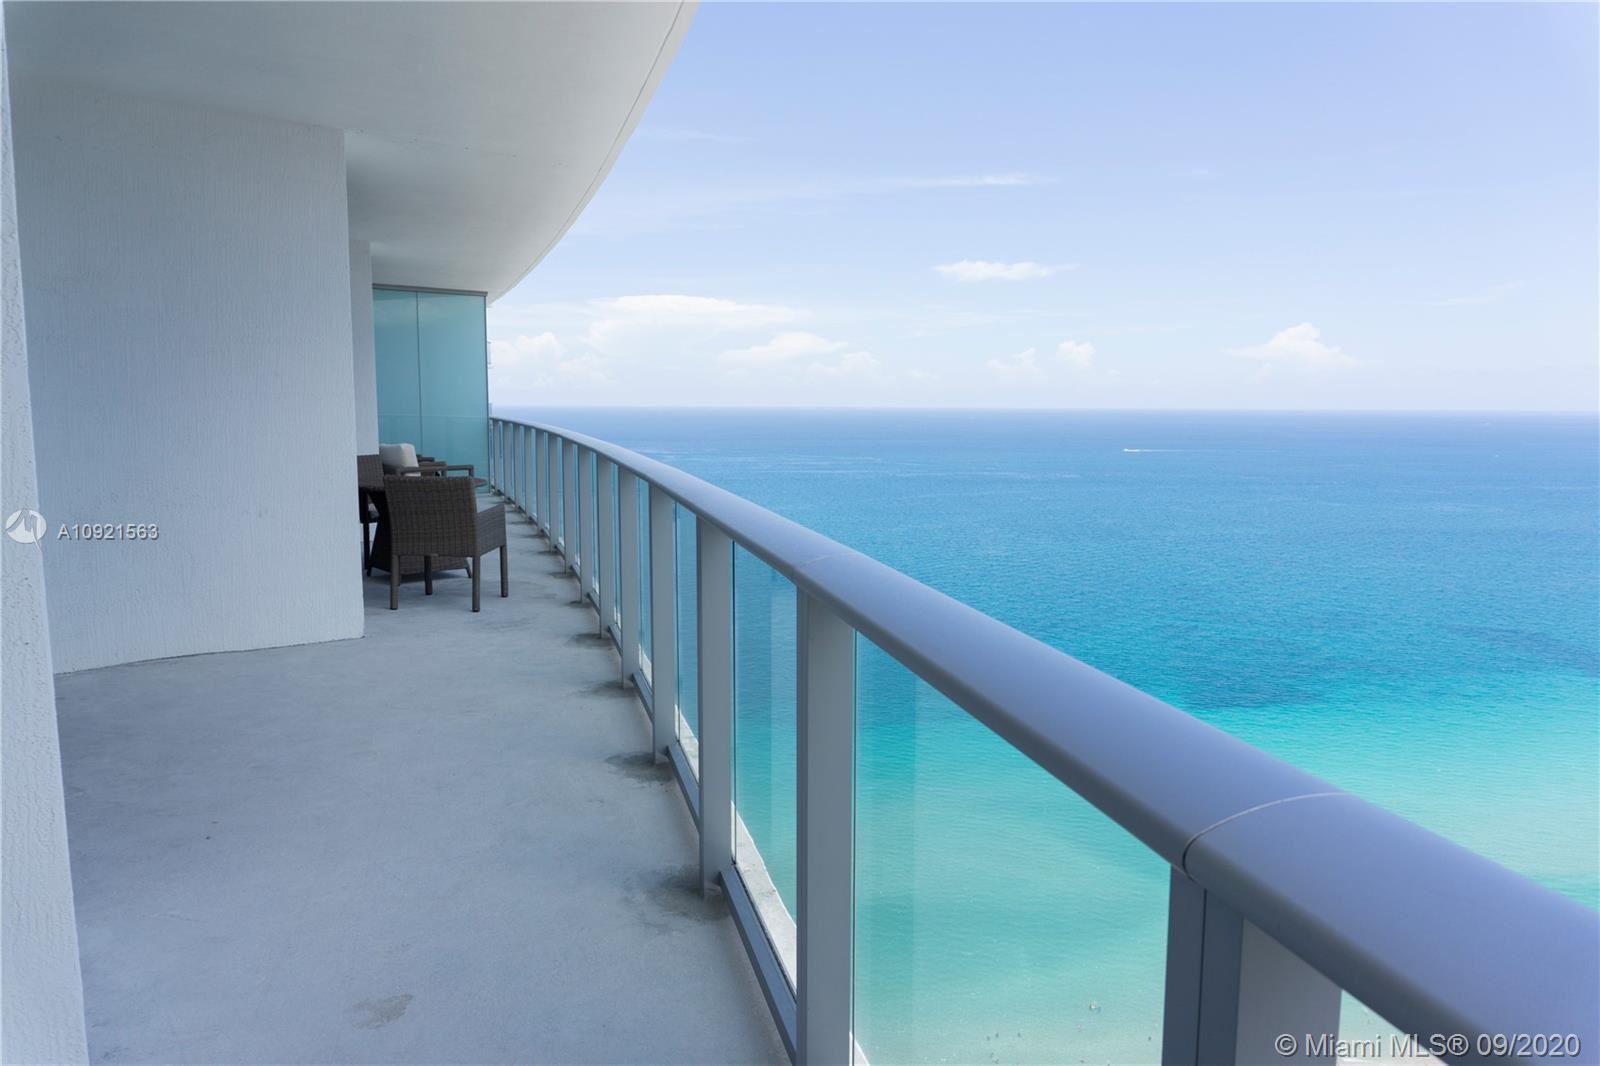 4111 S Ocean Dr #3507-3509, Hollywood, FL 33019 - #: A10921563